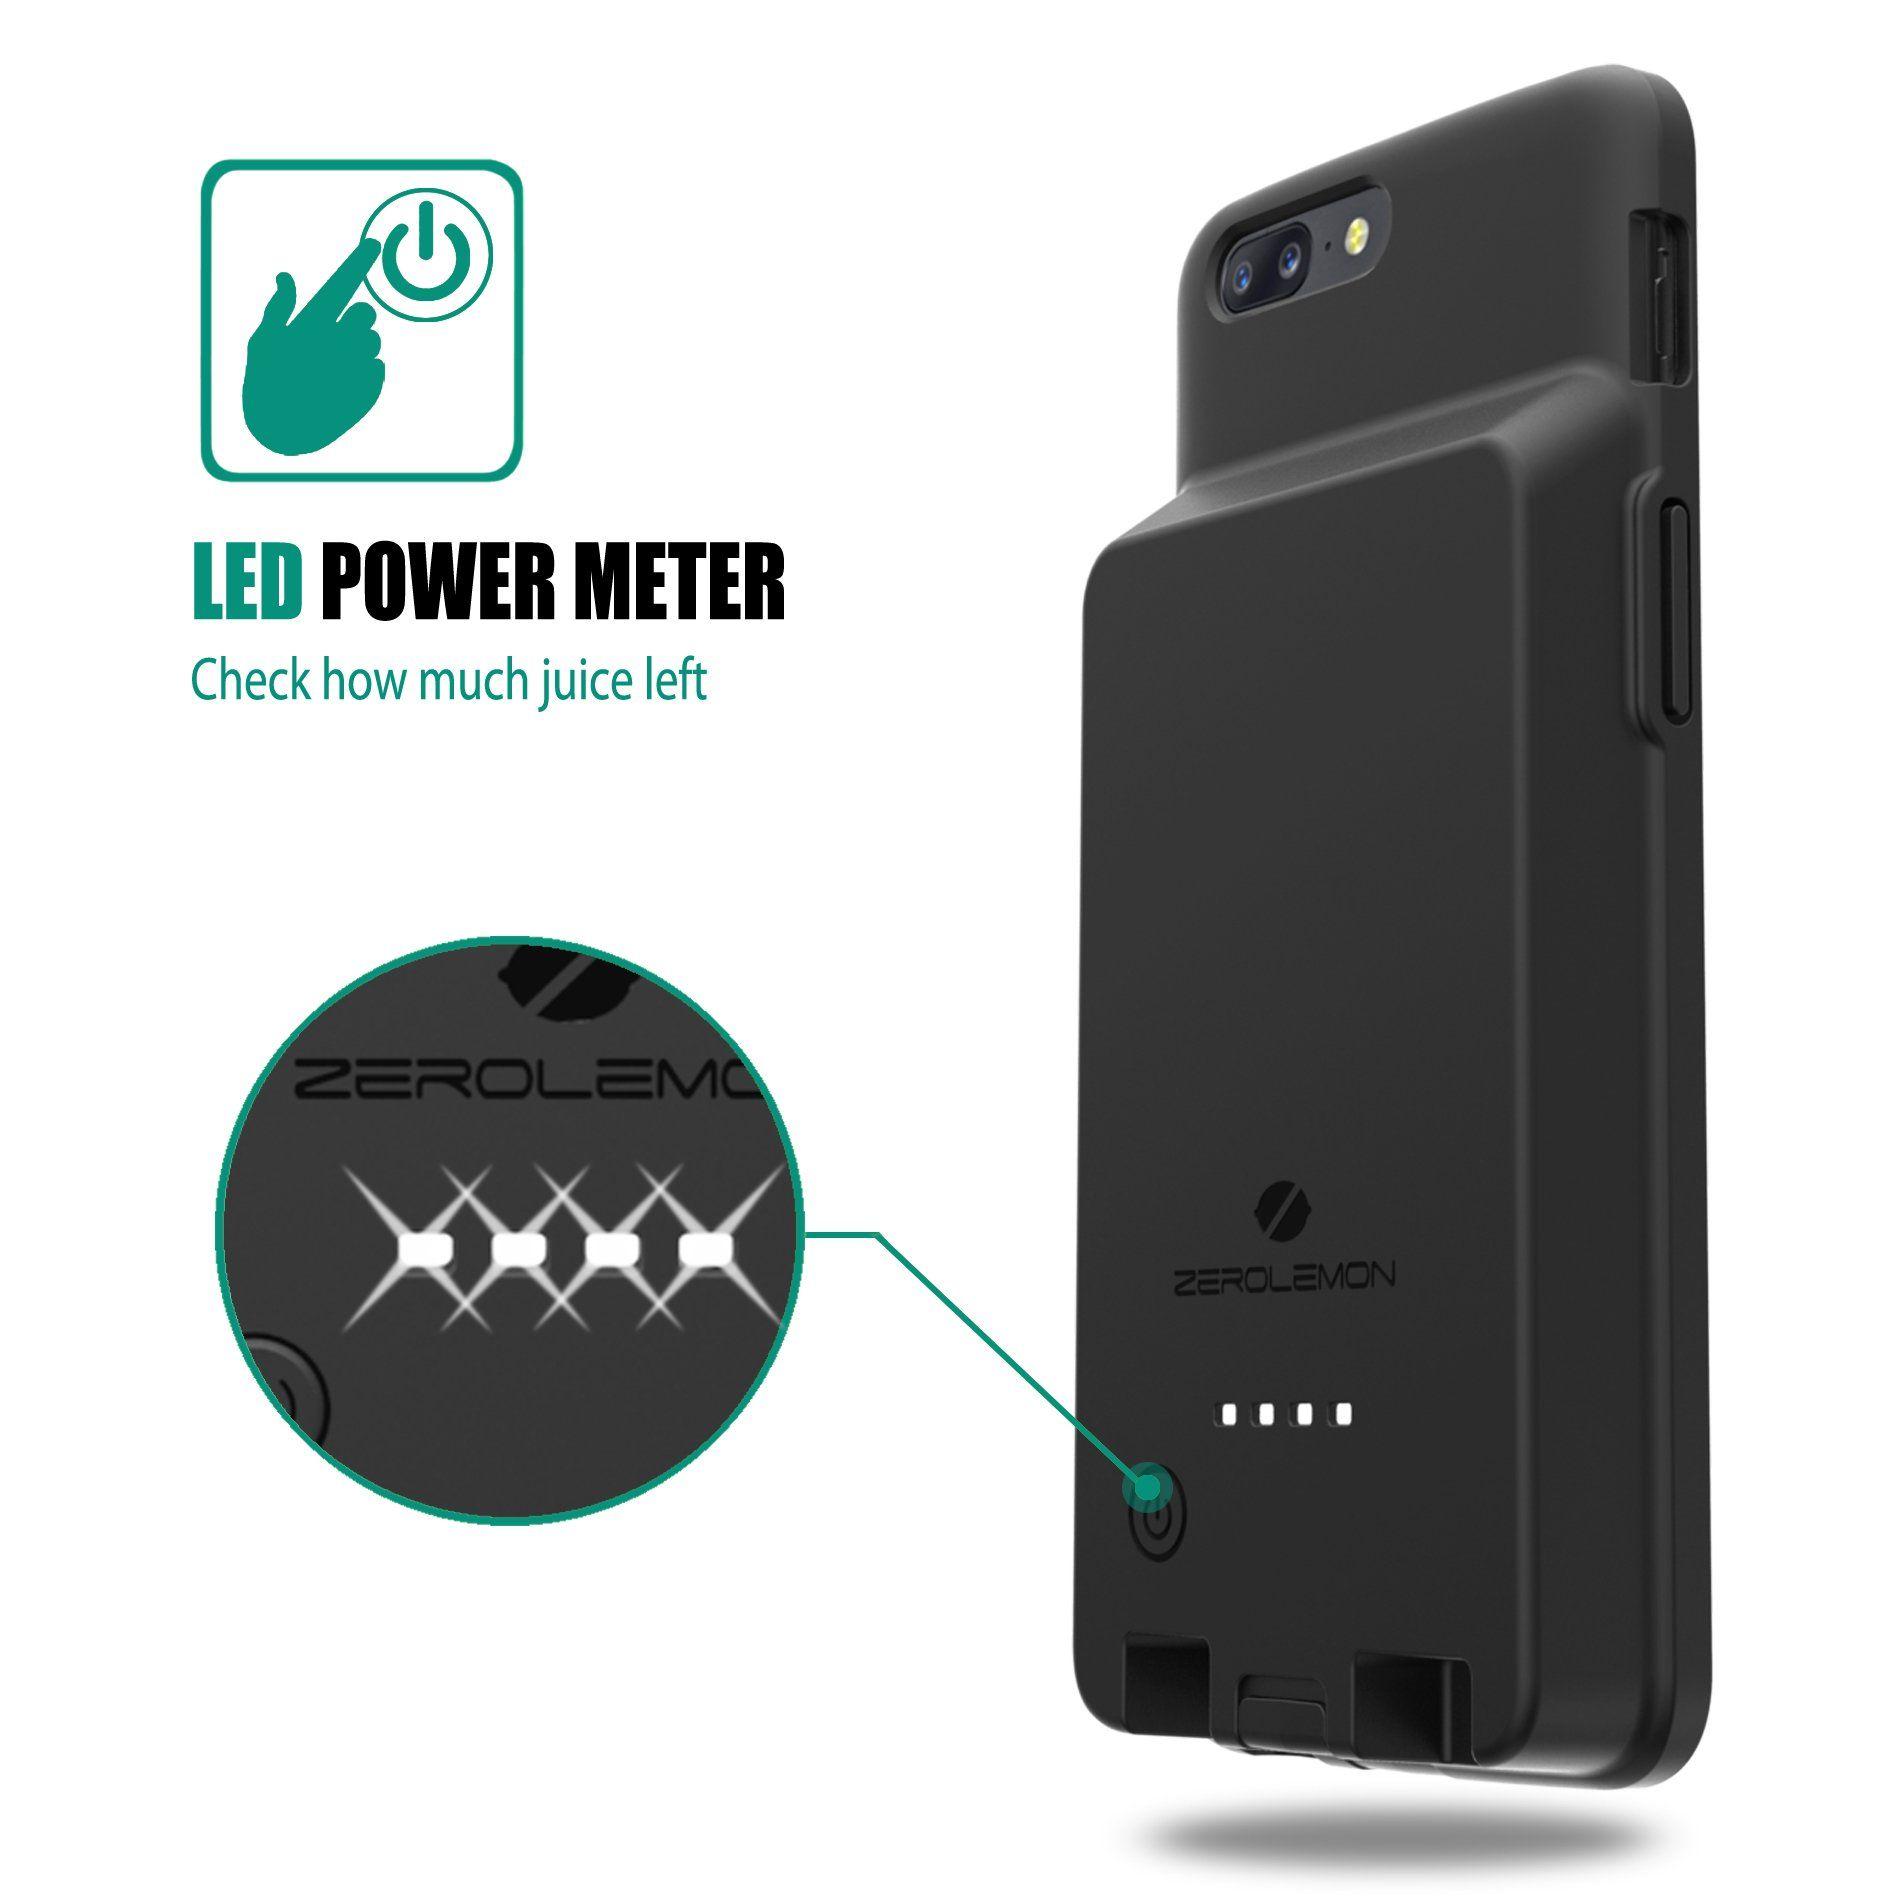 new arrival 595ed 00c4c OnePlus 5 Battery Case ZeroLemon Ultra Power OnePlus 5 8000mAh ...